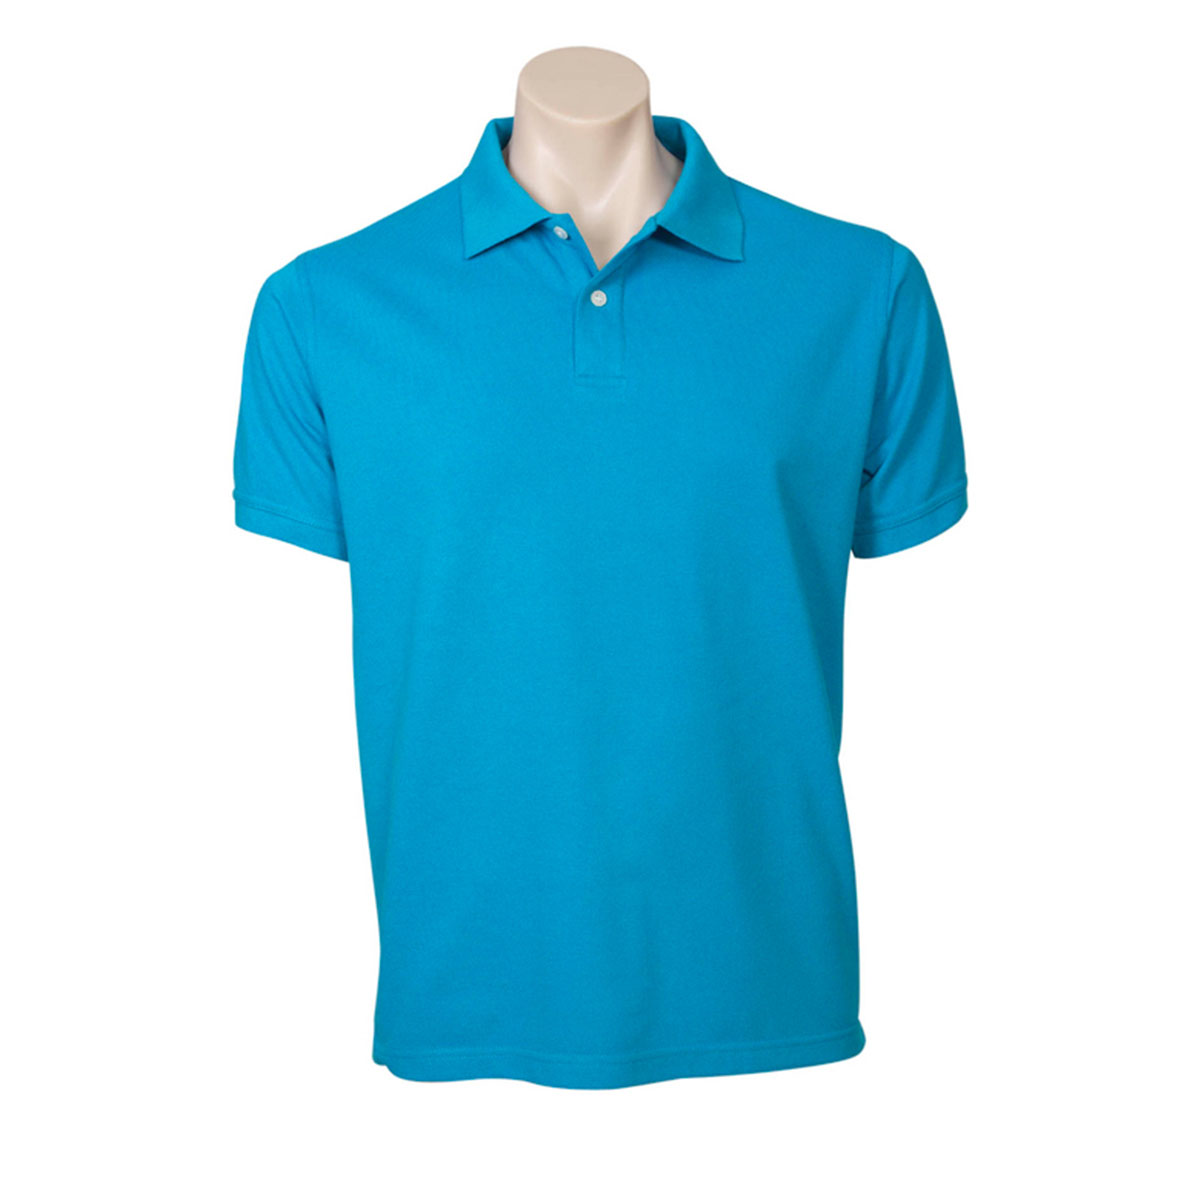 Mens Neon Polo-Cyan Blue